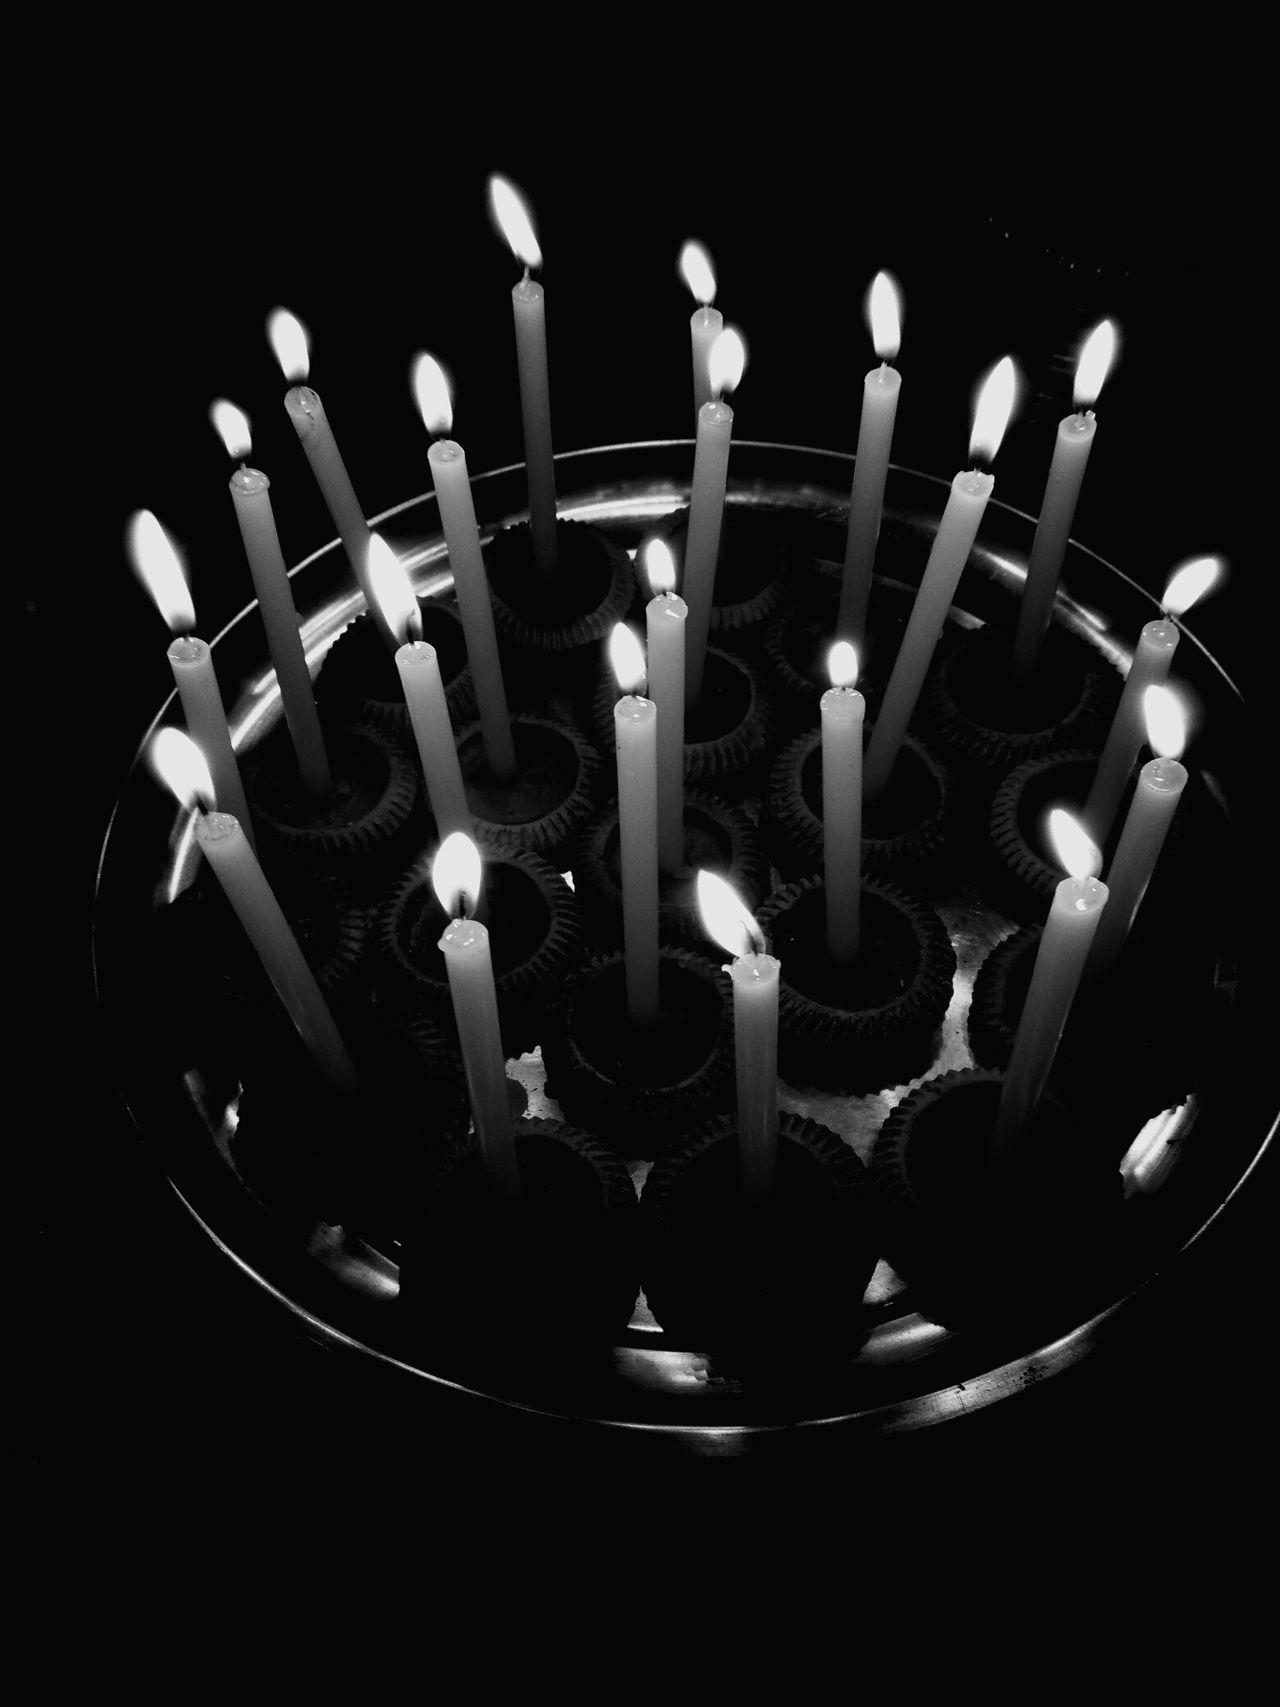 Black &White Candle Burning Flame Illuminated Celebration Cake Birthday Candles No People Birthday Cake Table Anniversary Close-up Indoors